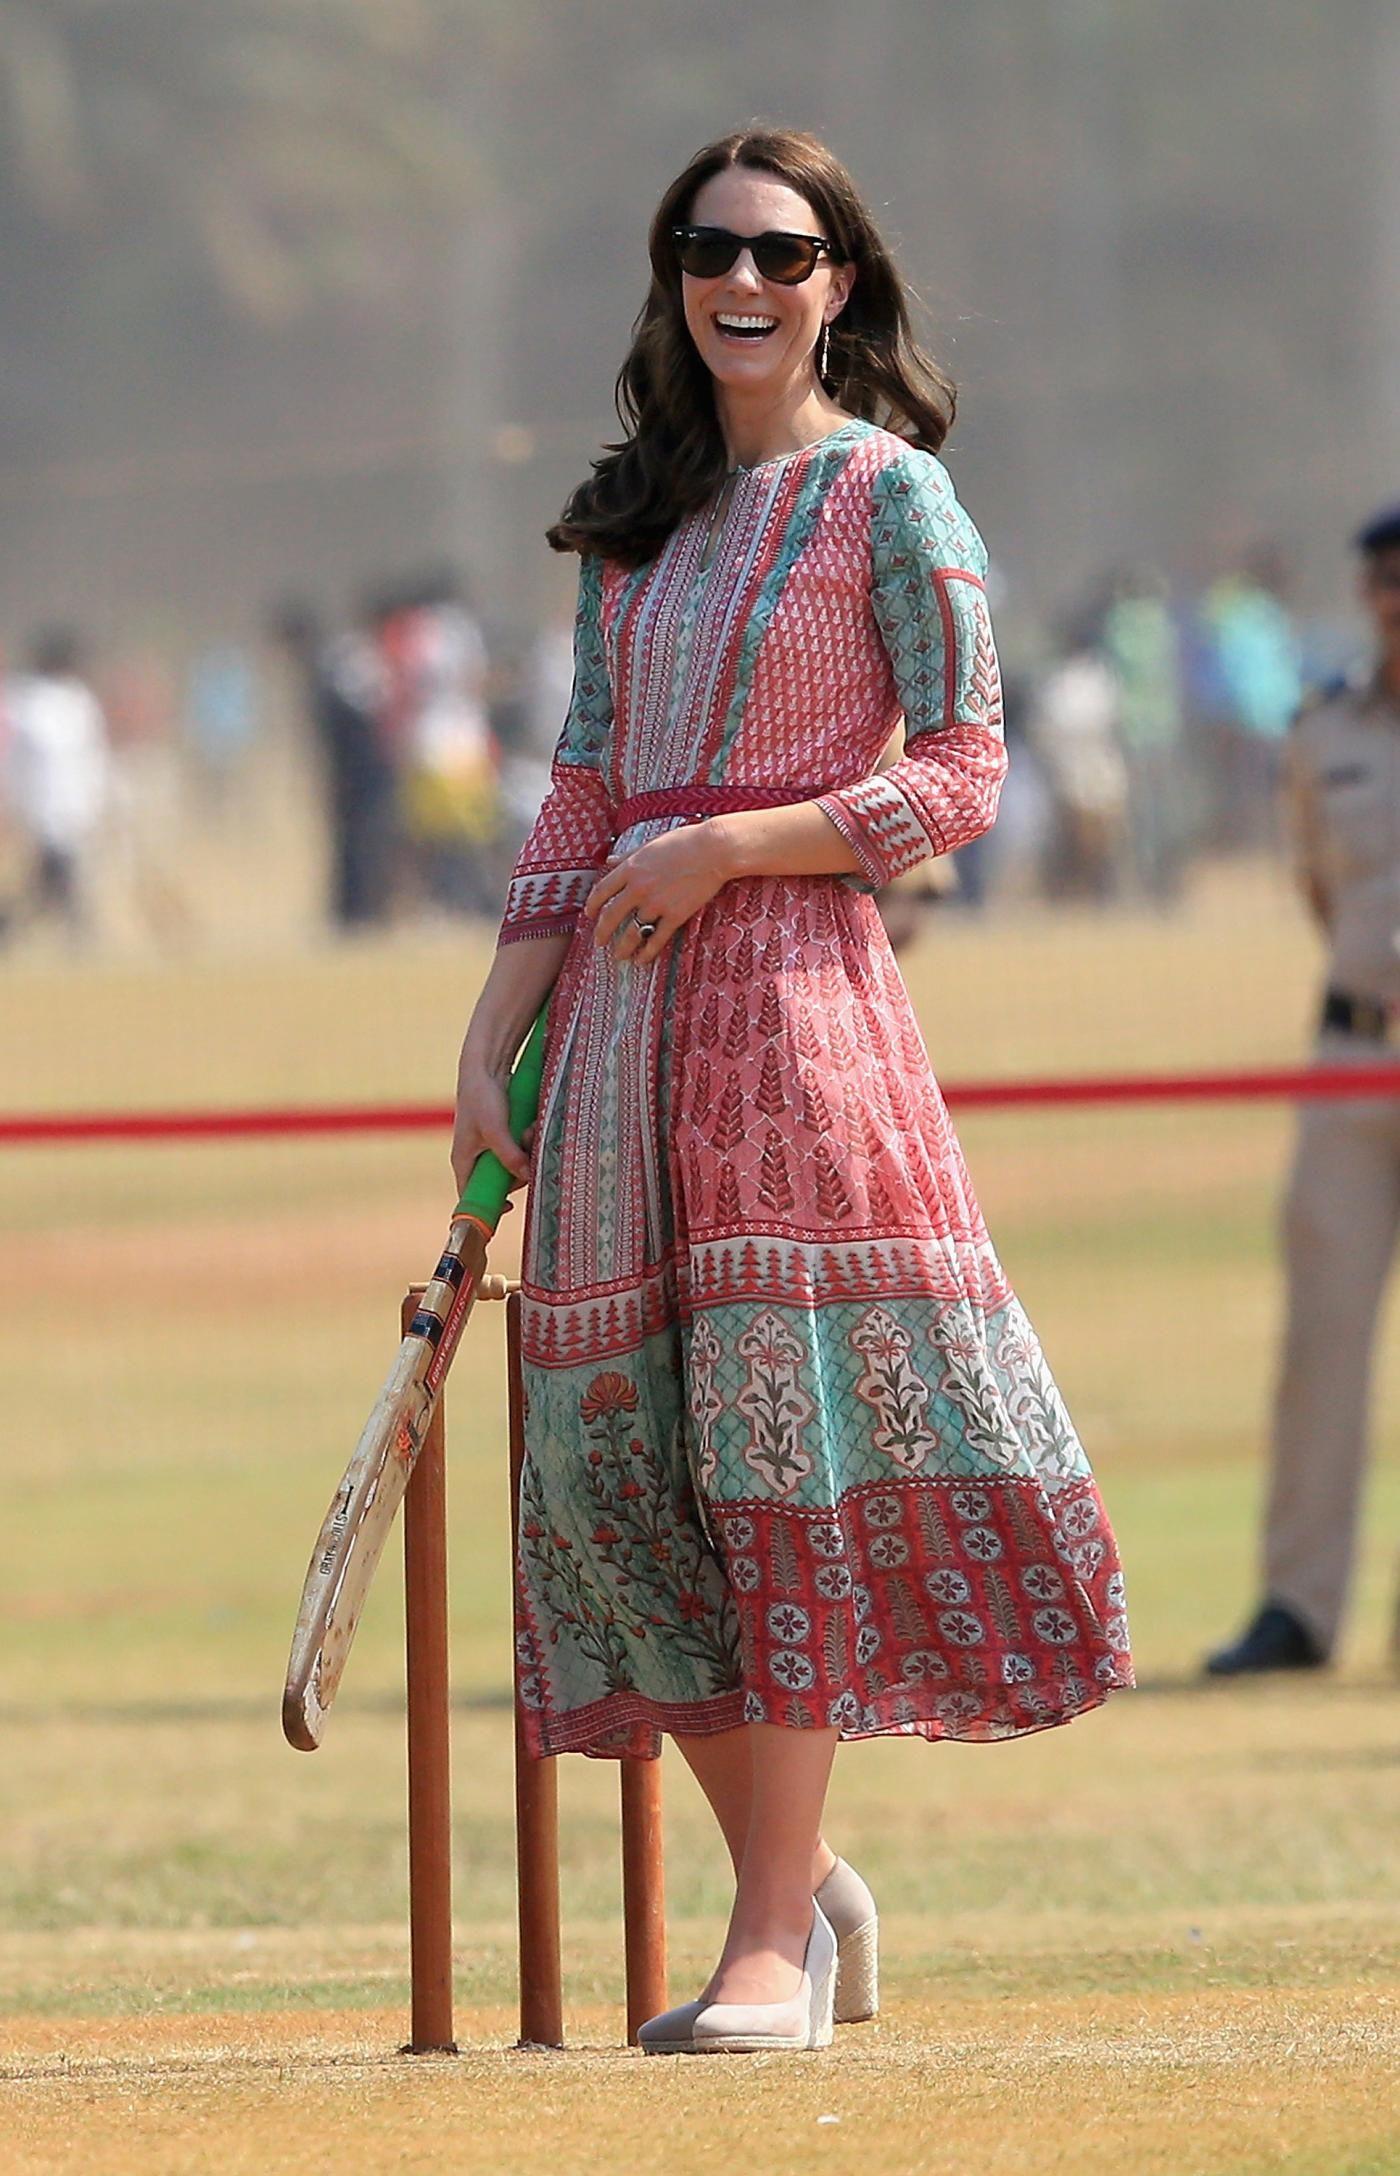 75eb74ac6834 Kate Middleton in Anita Dongre in Mumbai, India on Sunday. Chris  Jackson/Getty Images.